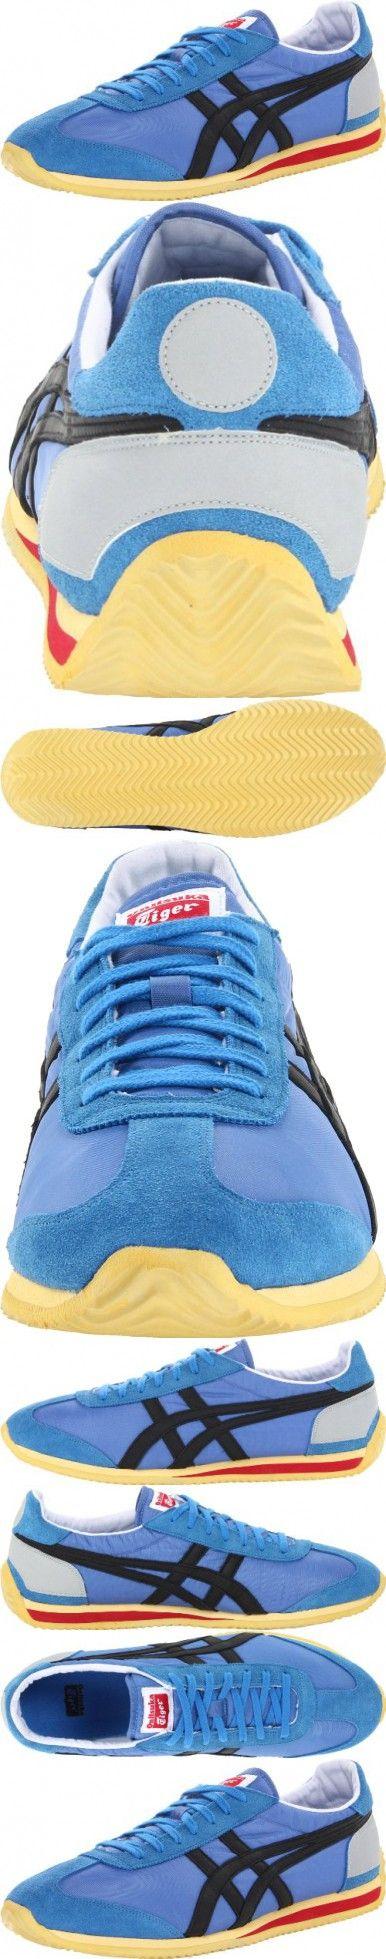 Asics Mens Onitsuka Tiger California 78 Vin Shoes In BlueBlack